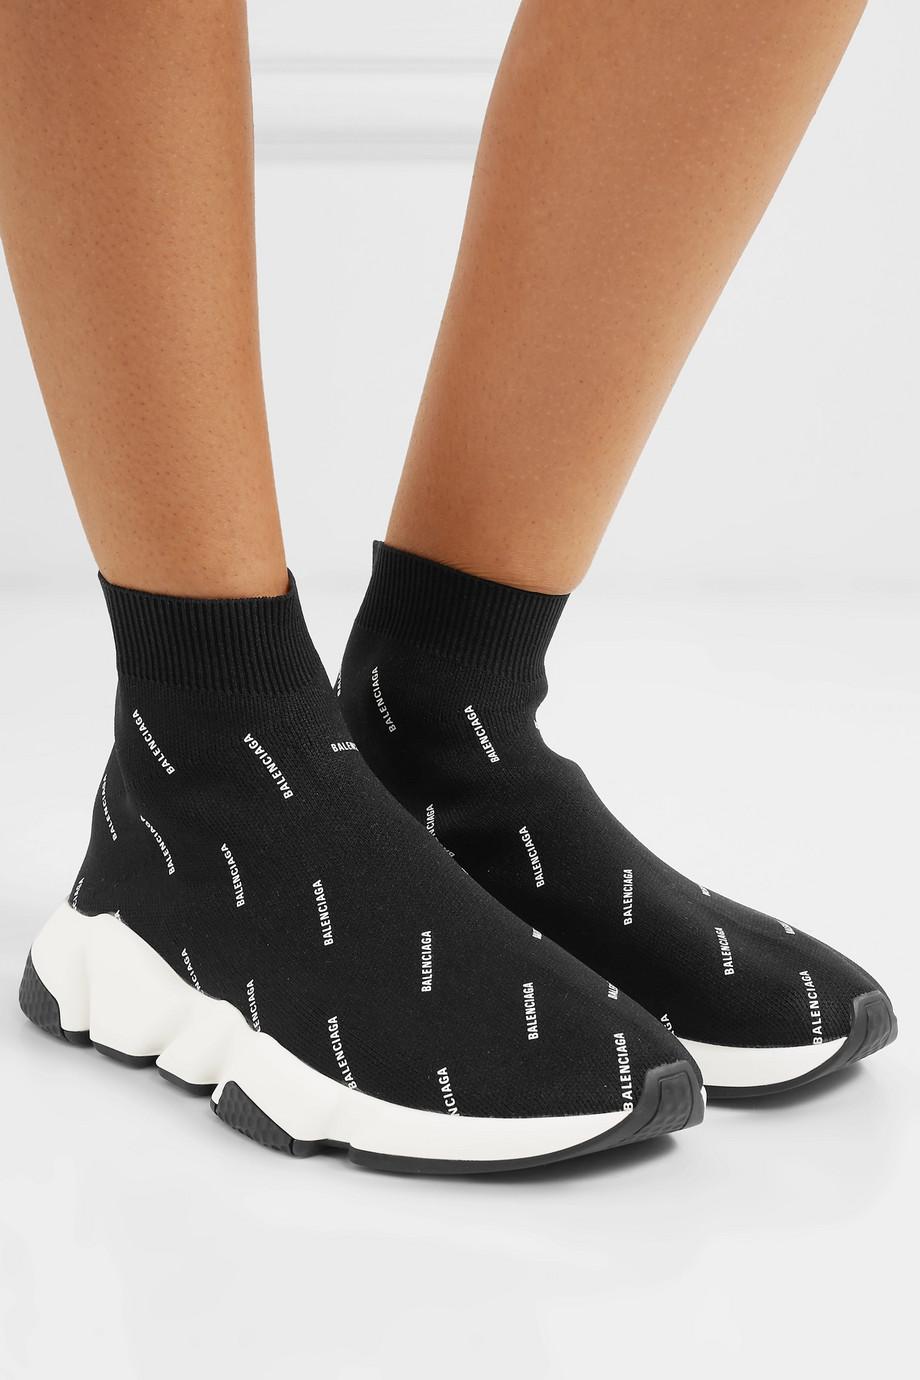 Balenciaga Speed 品牌标志印花弹力针织高帮运动鞋